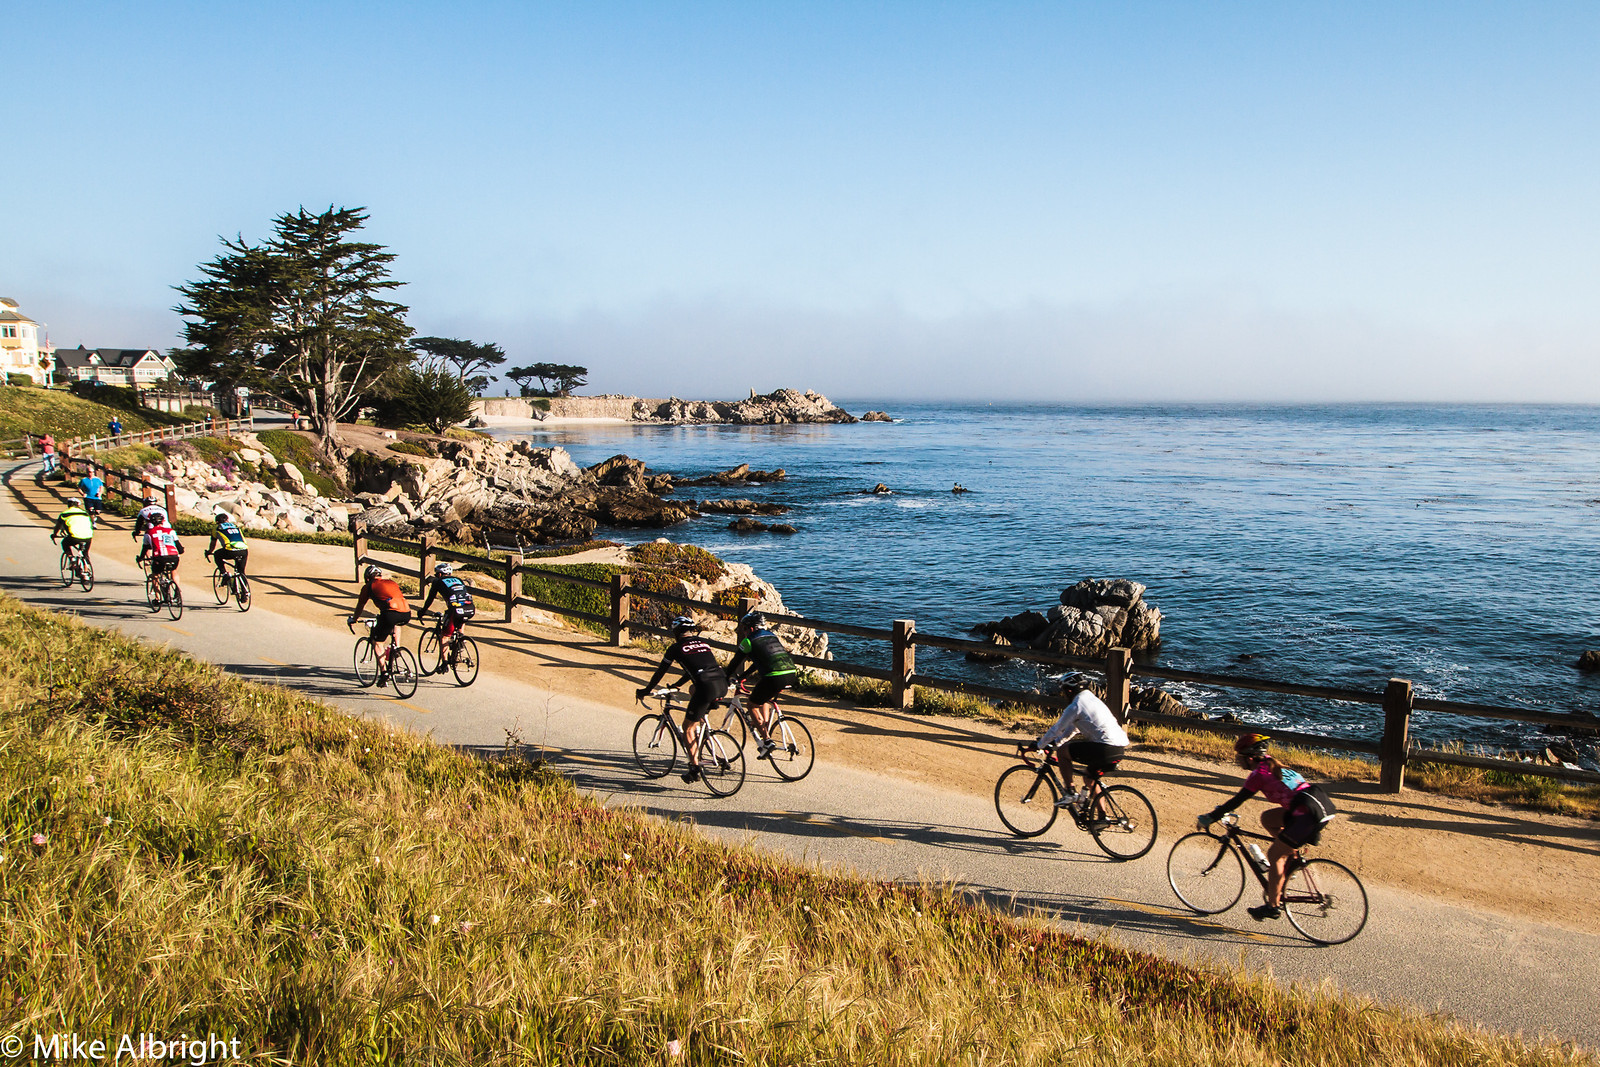 2013 Sea Otter - bikesales - Mountain Biking Pictures - Vital MTB